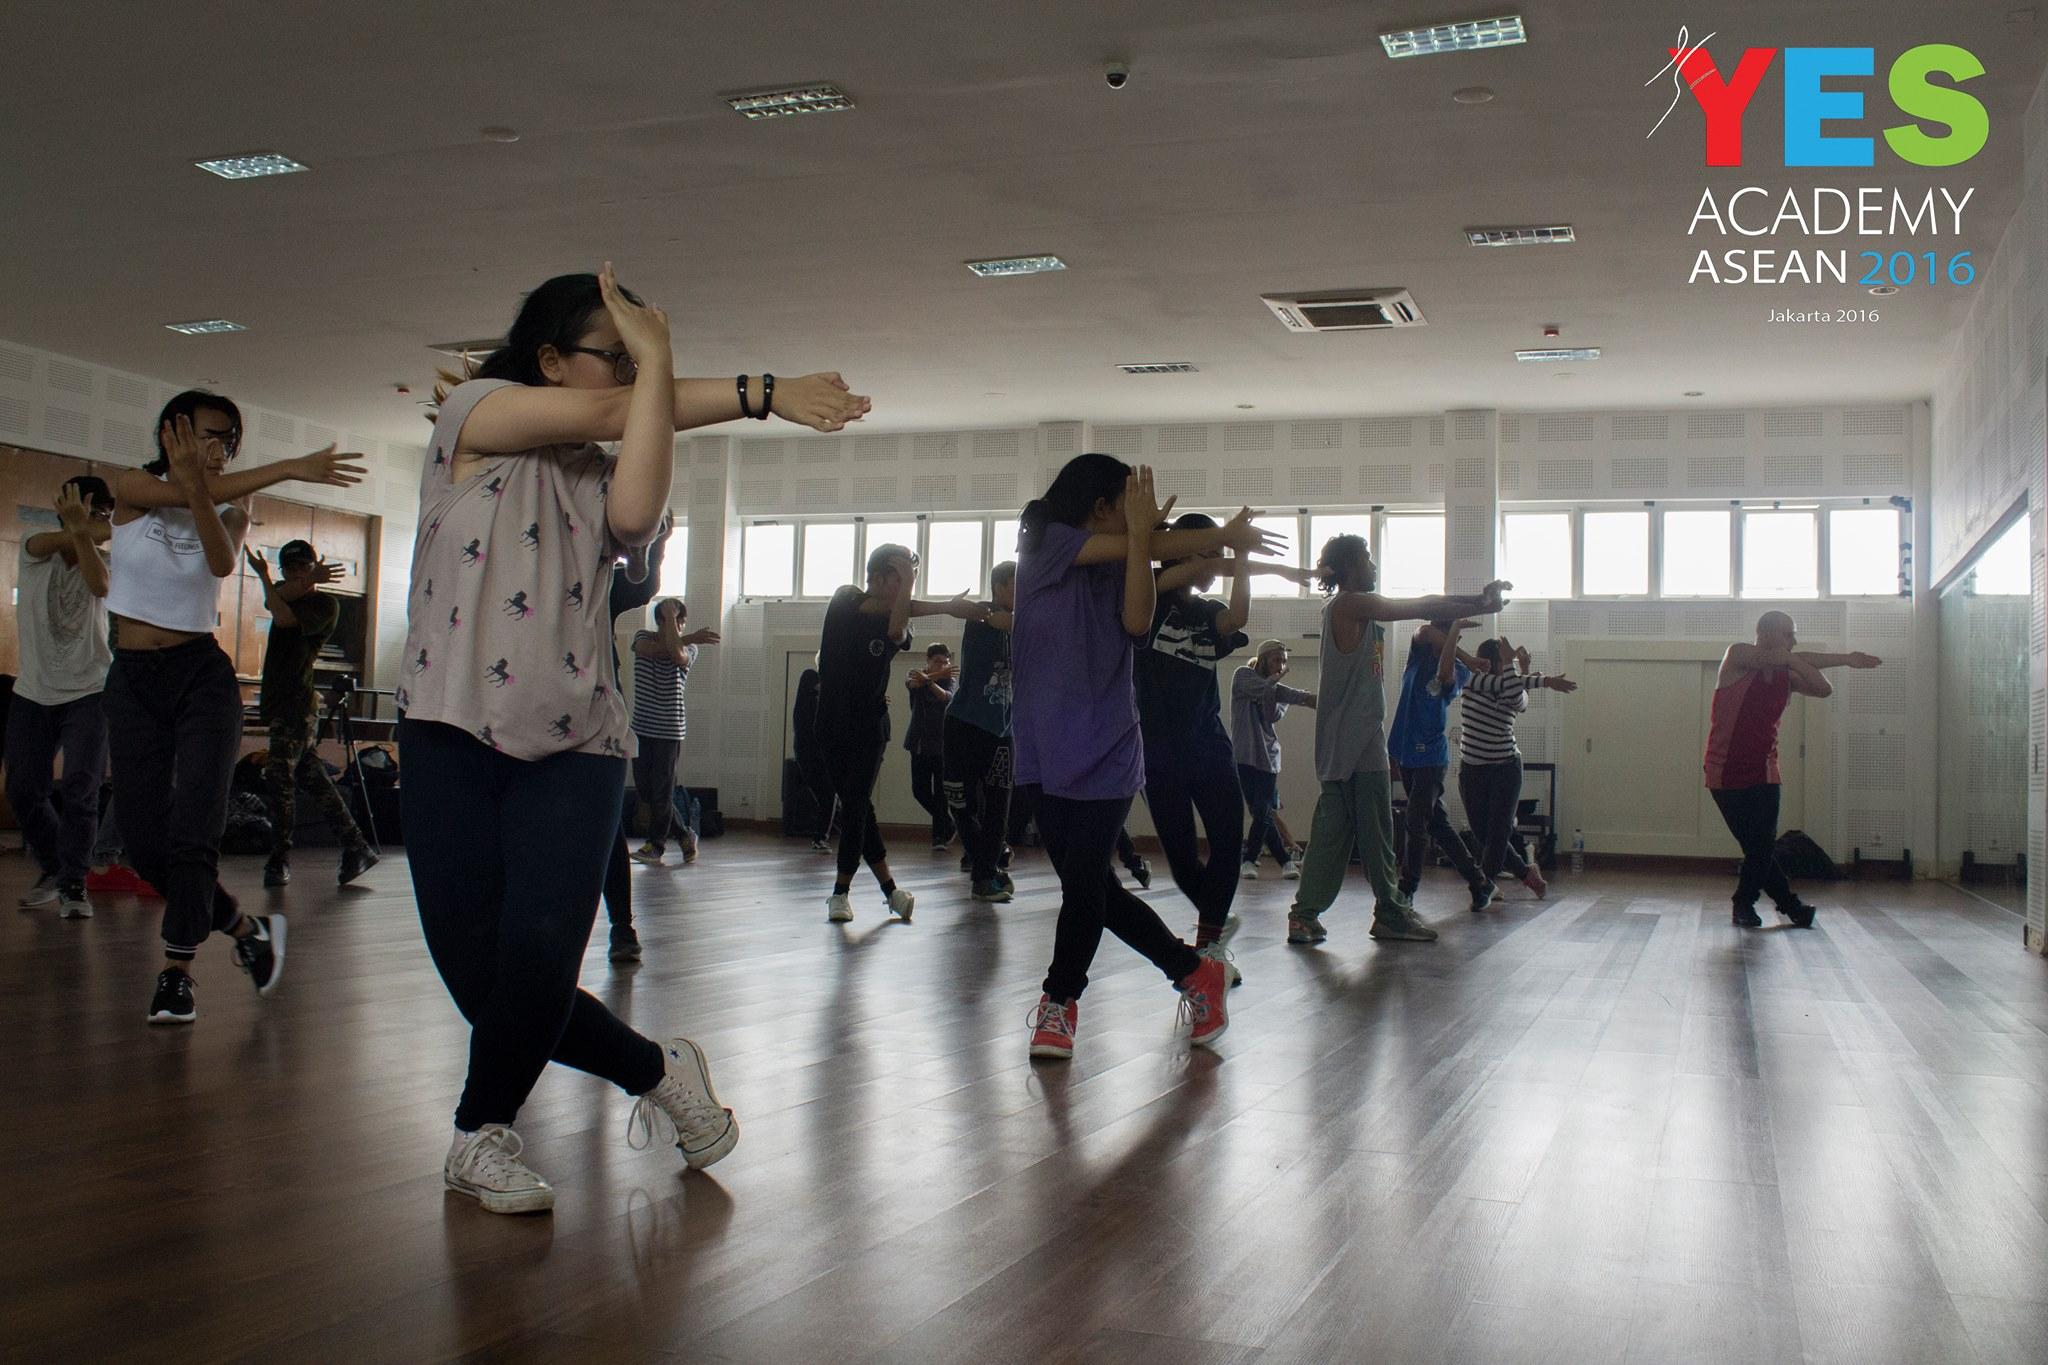 Yes Academy ASEAN - Jakarta 2016